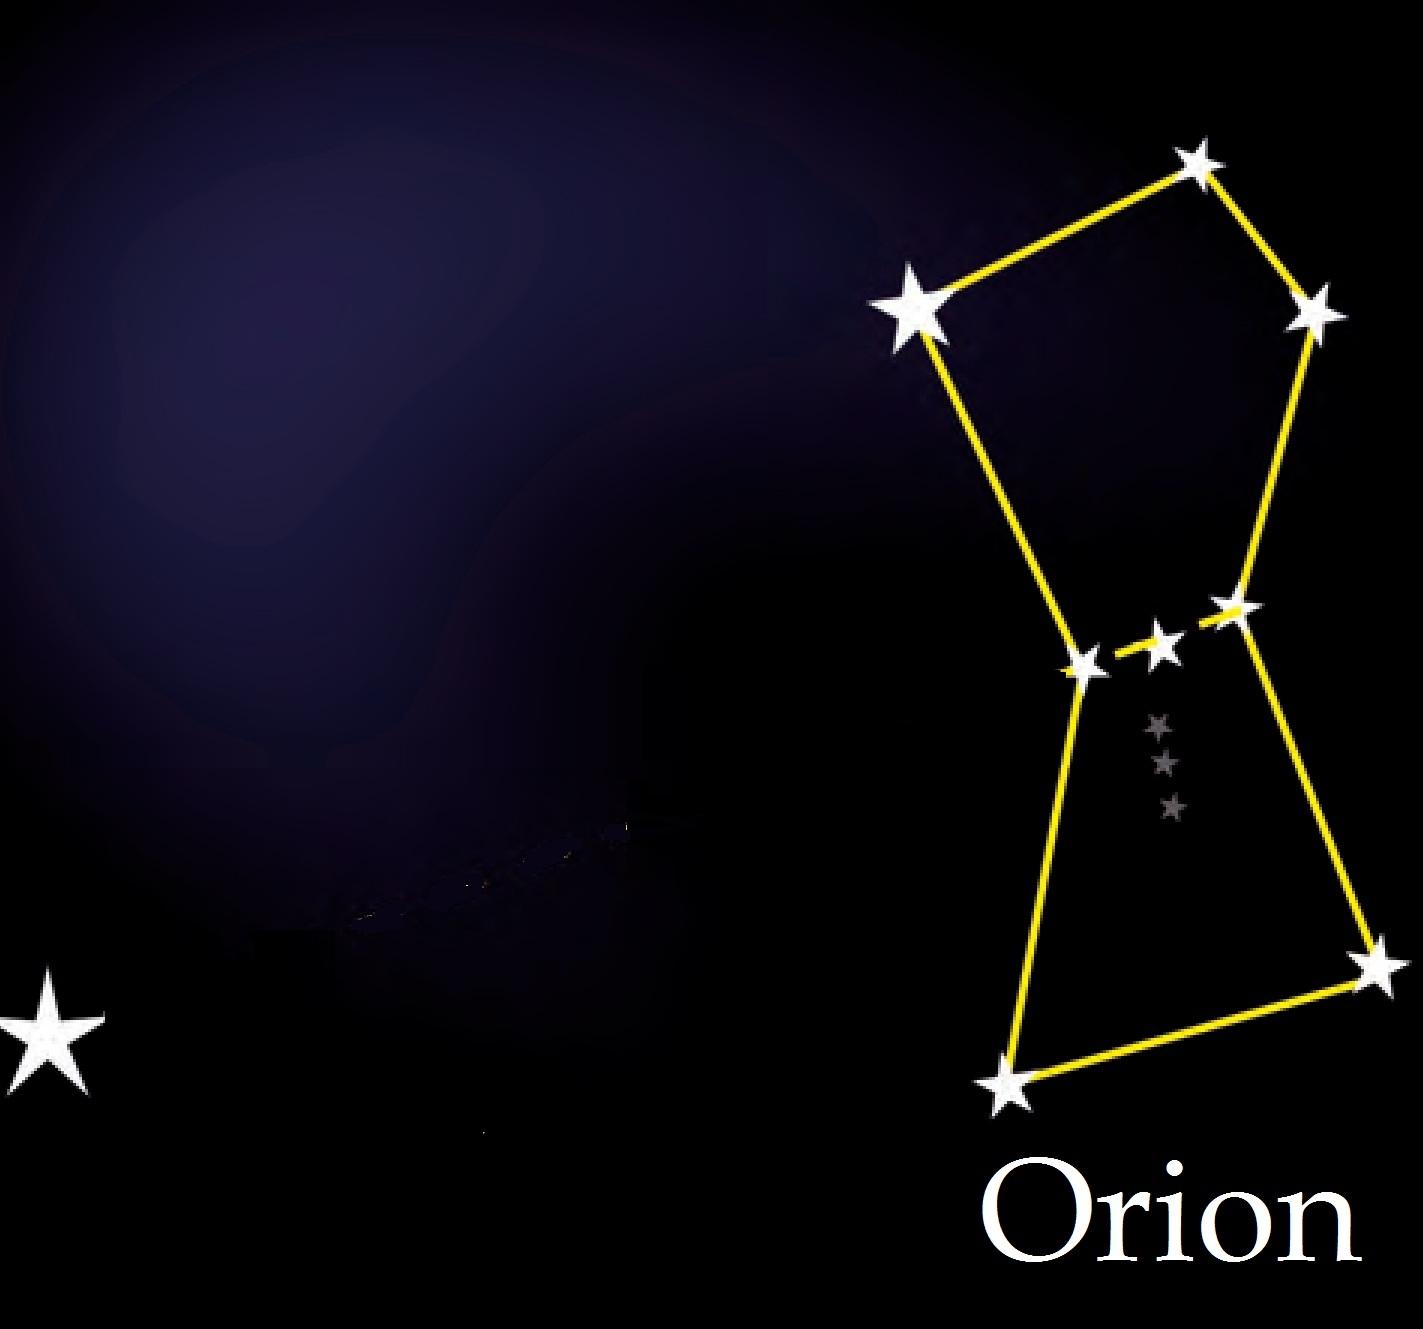 Finding Sirius from Orion - Step 1 - Finding Orion - Teachoo.jpg